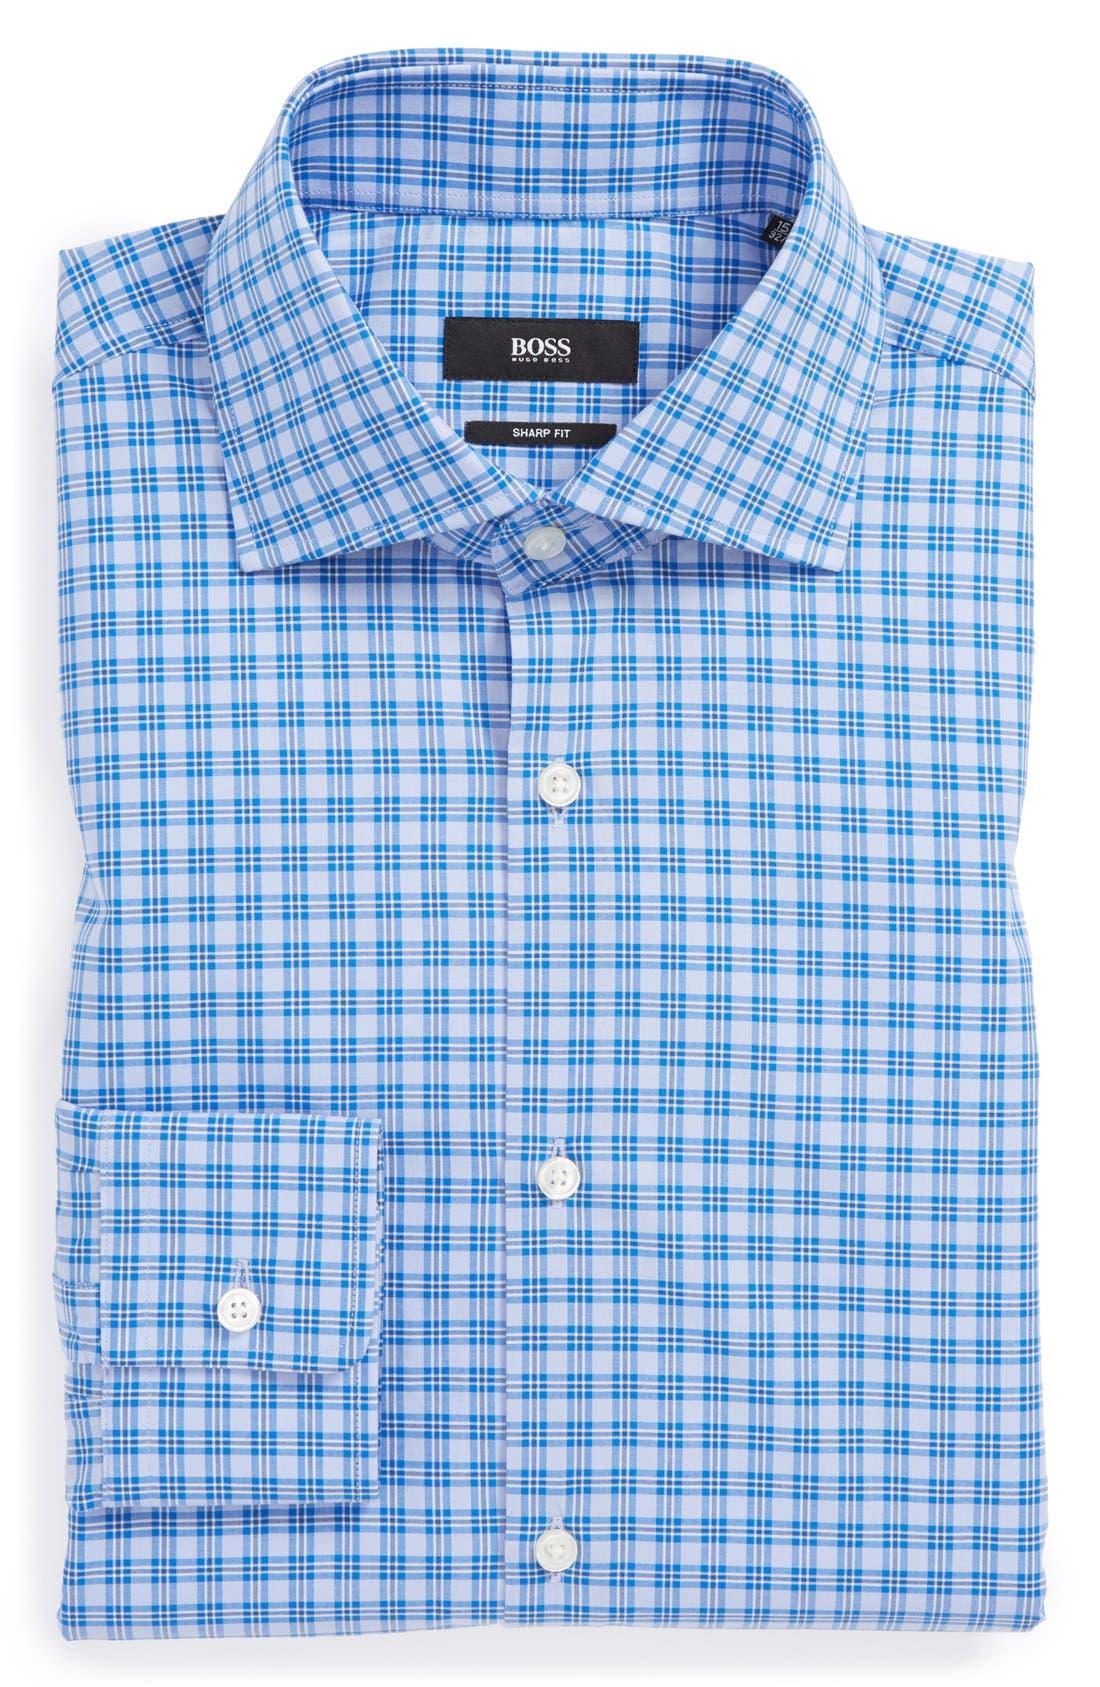 Alternate Image 1 Selected - BOSS HUGO BOSS 'Miles US' Sharp Fit Check Dress Shirt